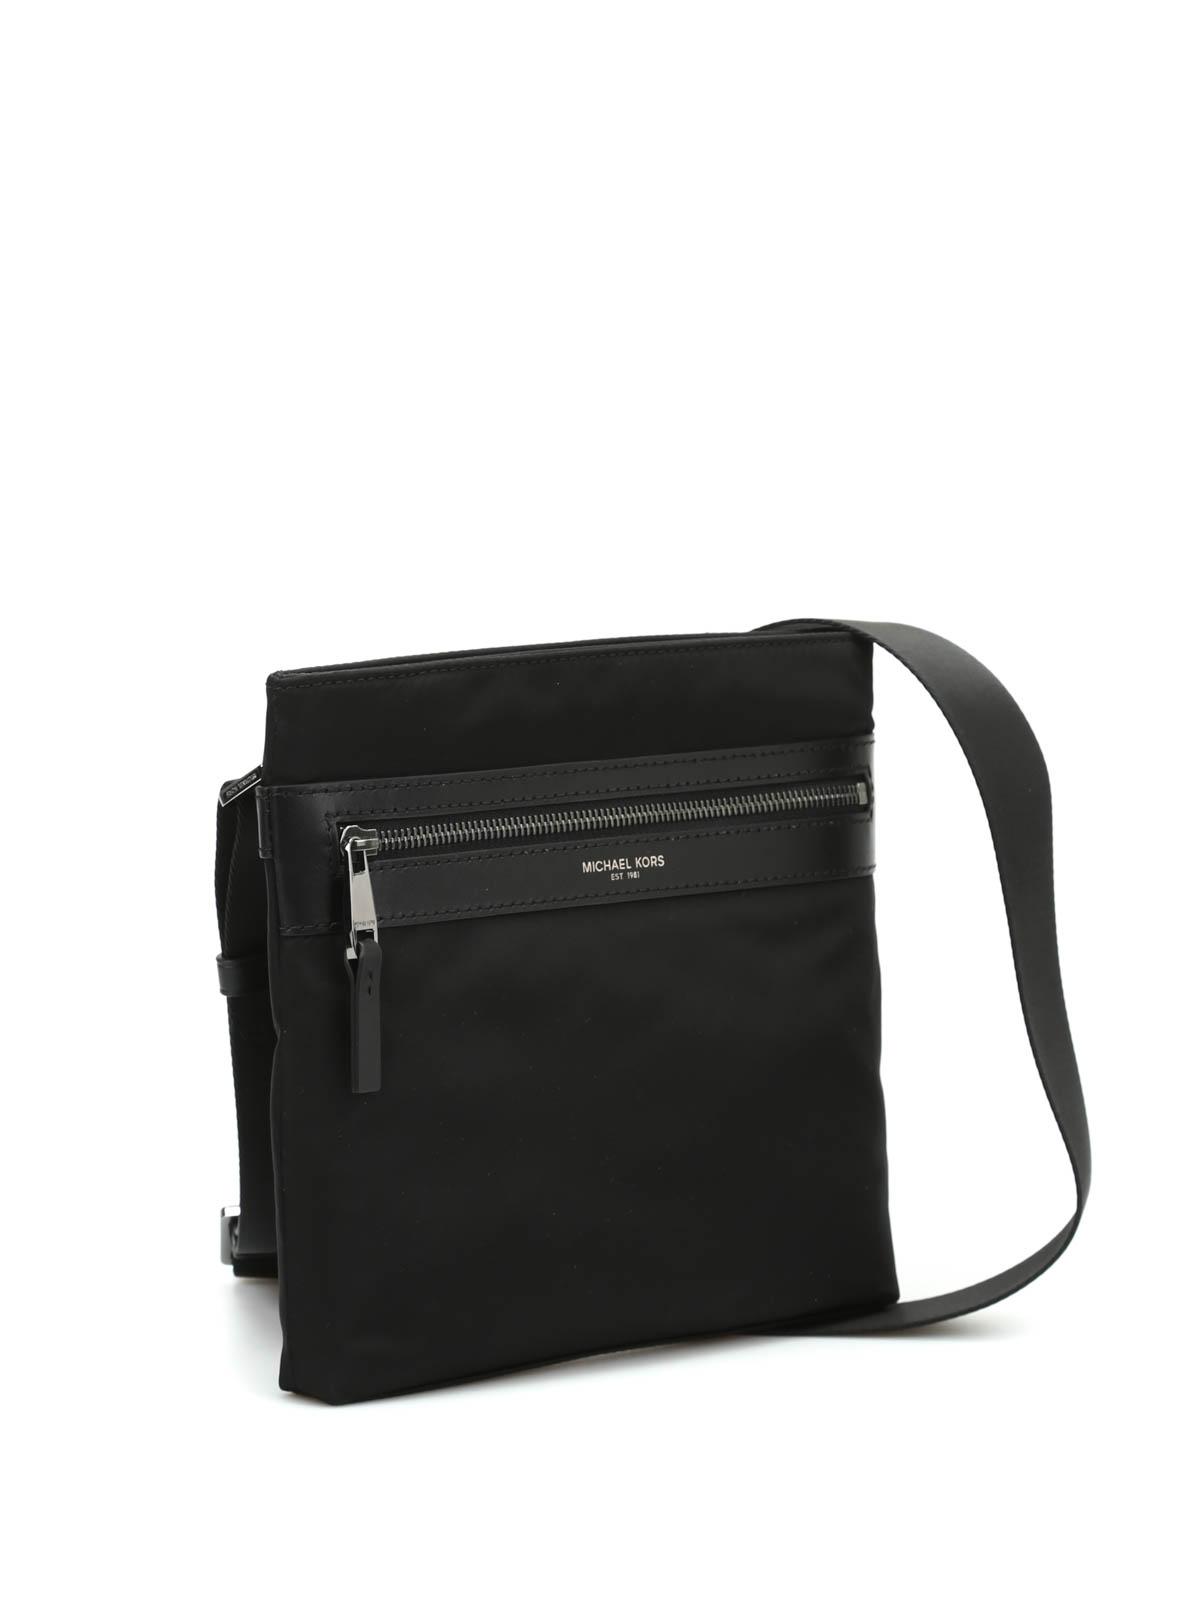 a09bba9fdc70 Michael Kors - Kent messenger bag - cross body bags - 33S6LKNC5C BLACK